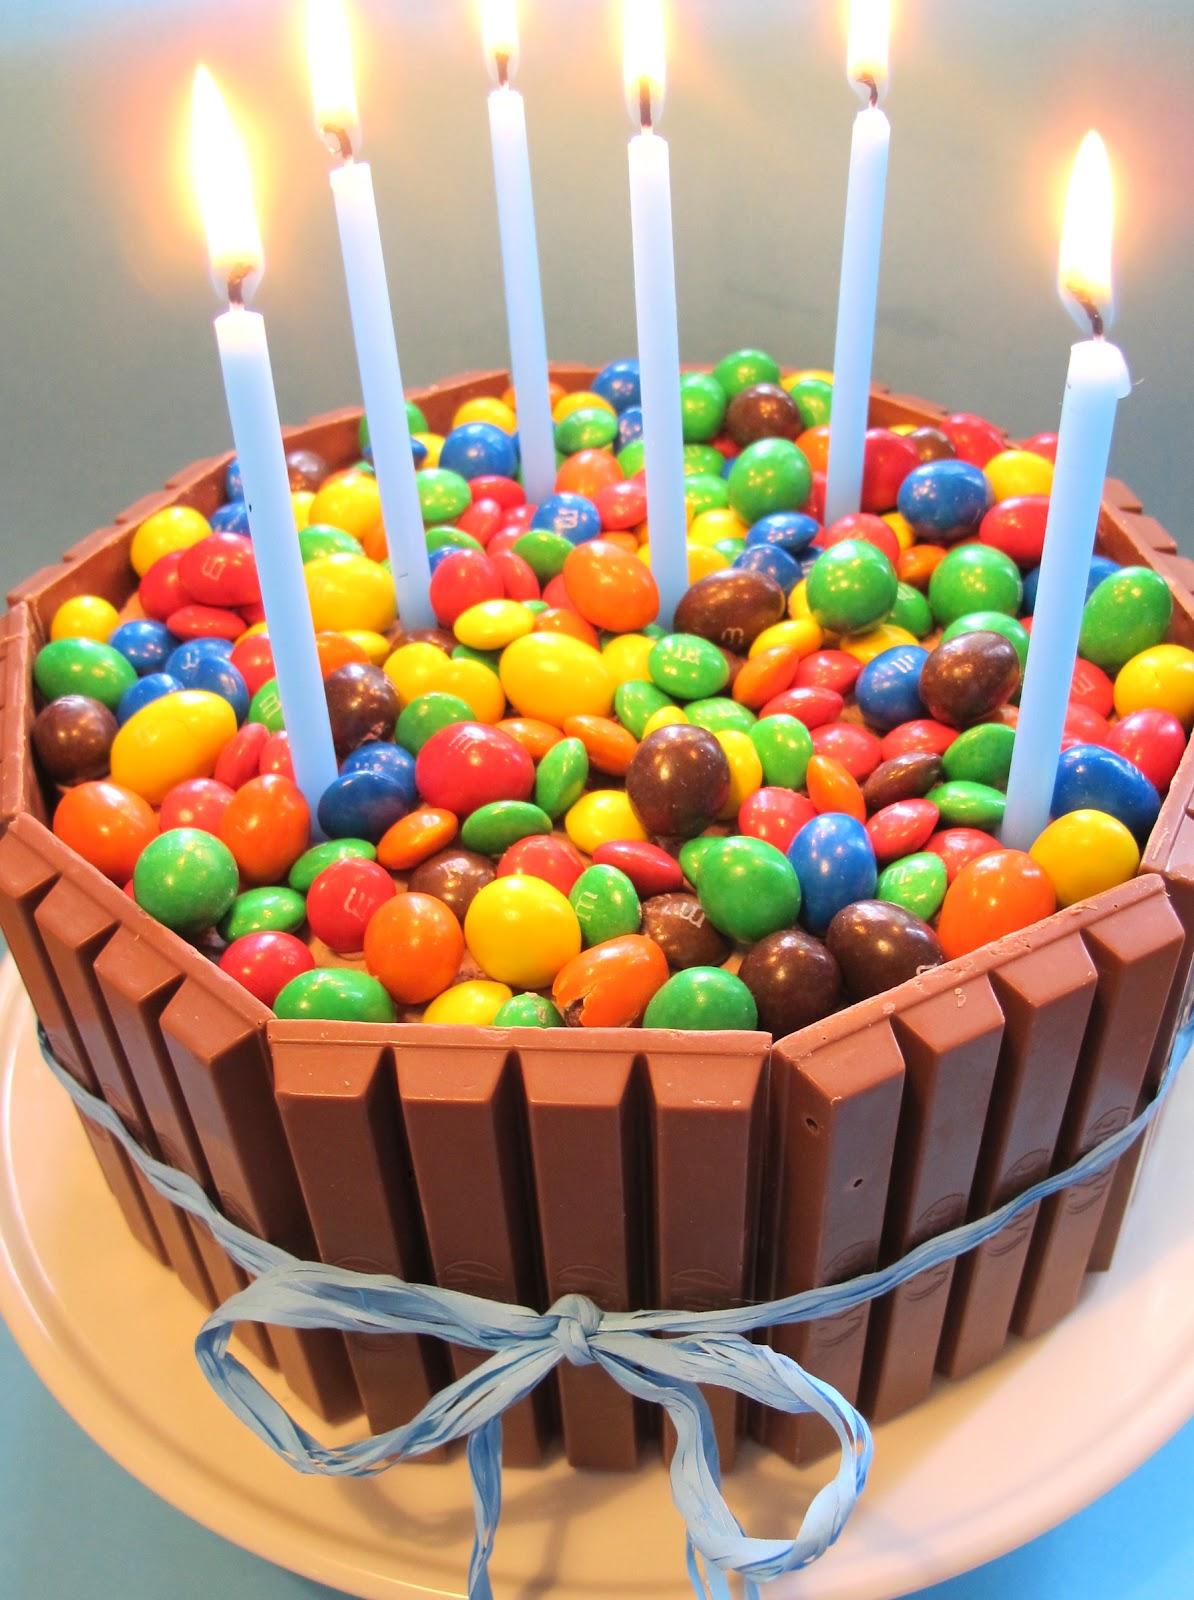 göra tårta själv